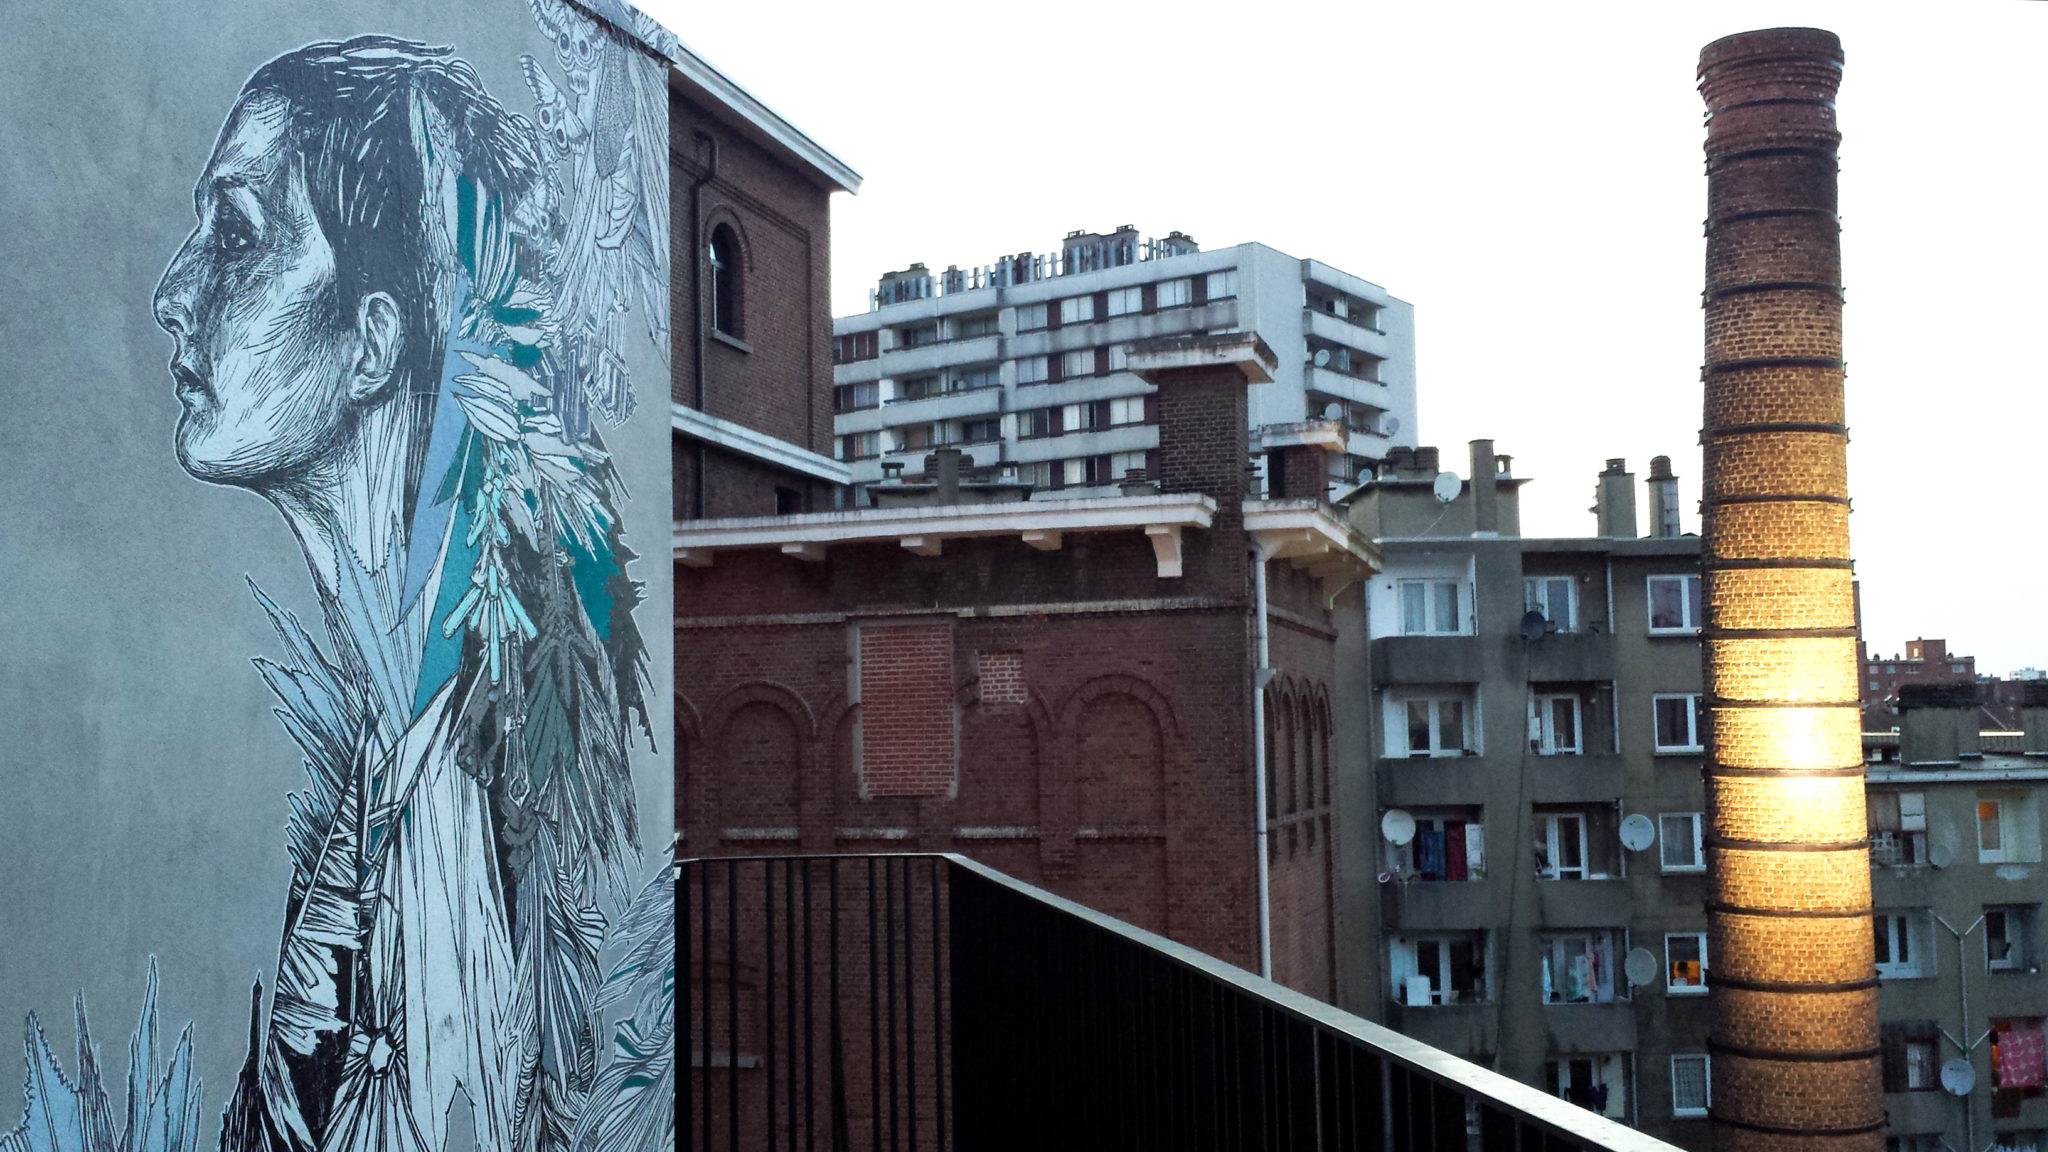 Mima_millenium_iconoclast_museum_art_terrasse_swoon_cheminee